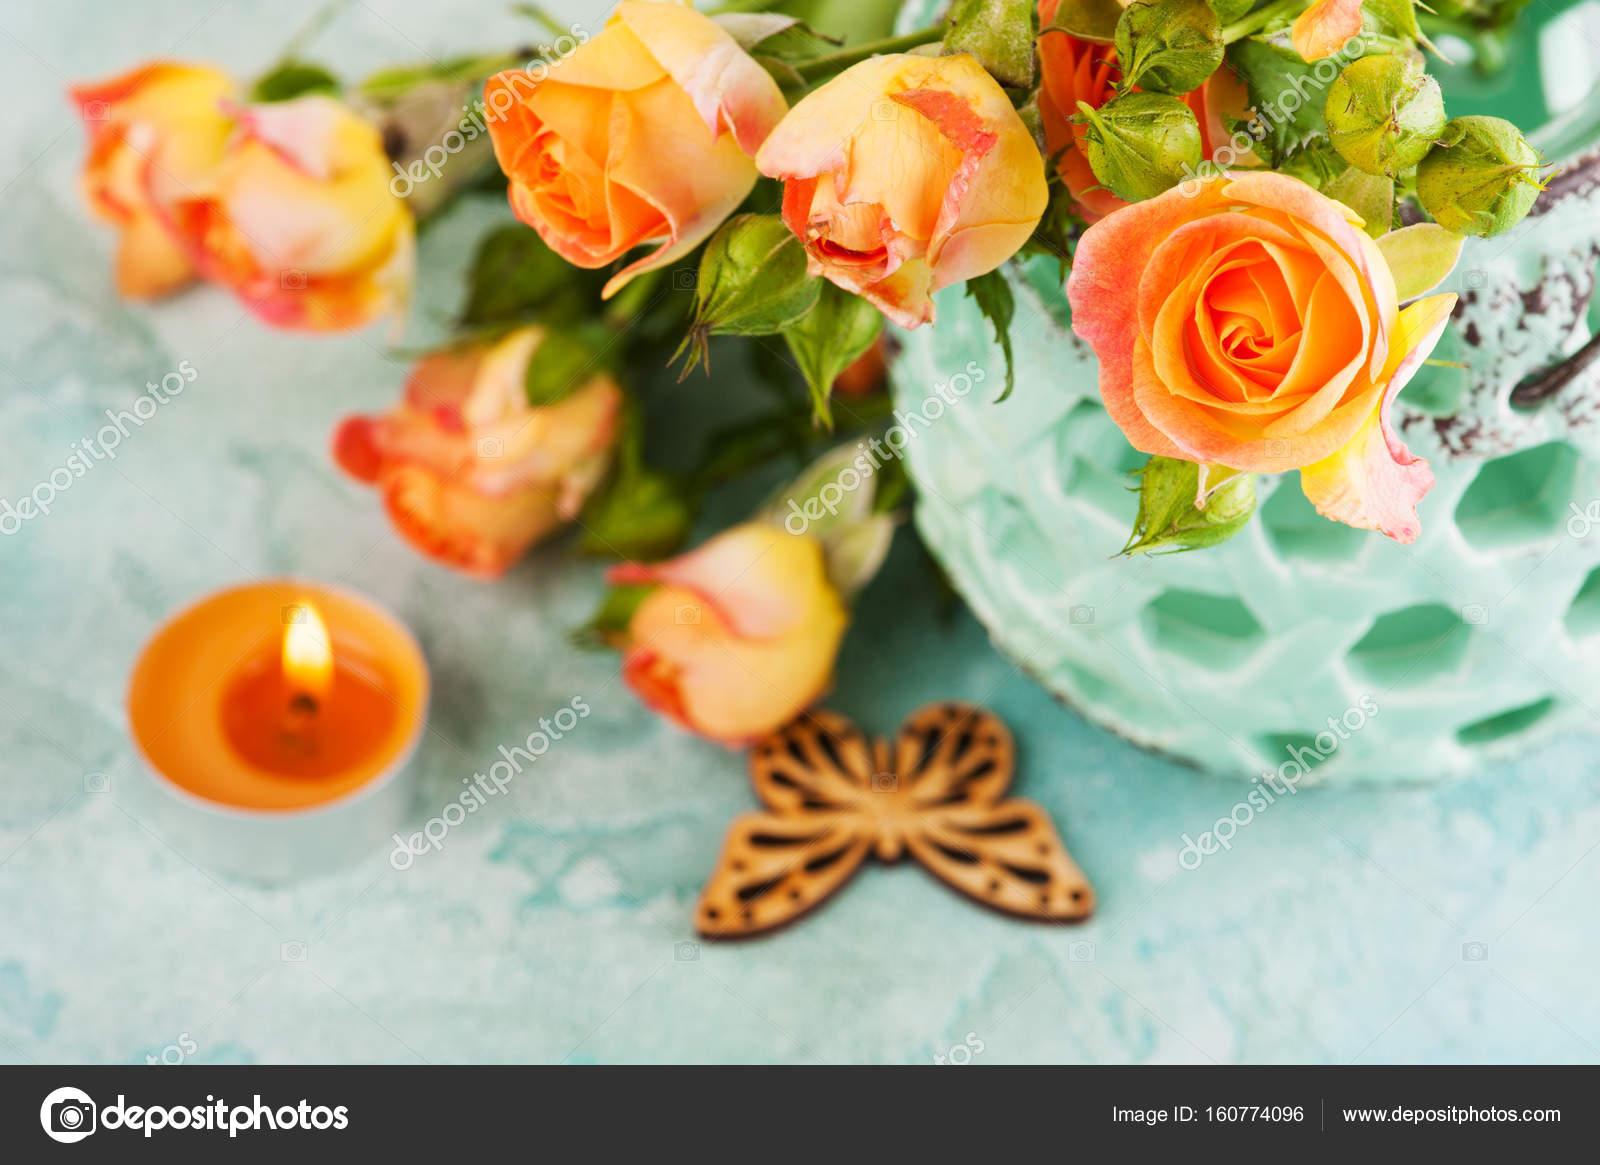 https://st3.depositphotos.com/3608211/16077/i/1600/depositphotos_160774096-stockafbeelding-fris-oranje-rozen-bloemen-in.jpg